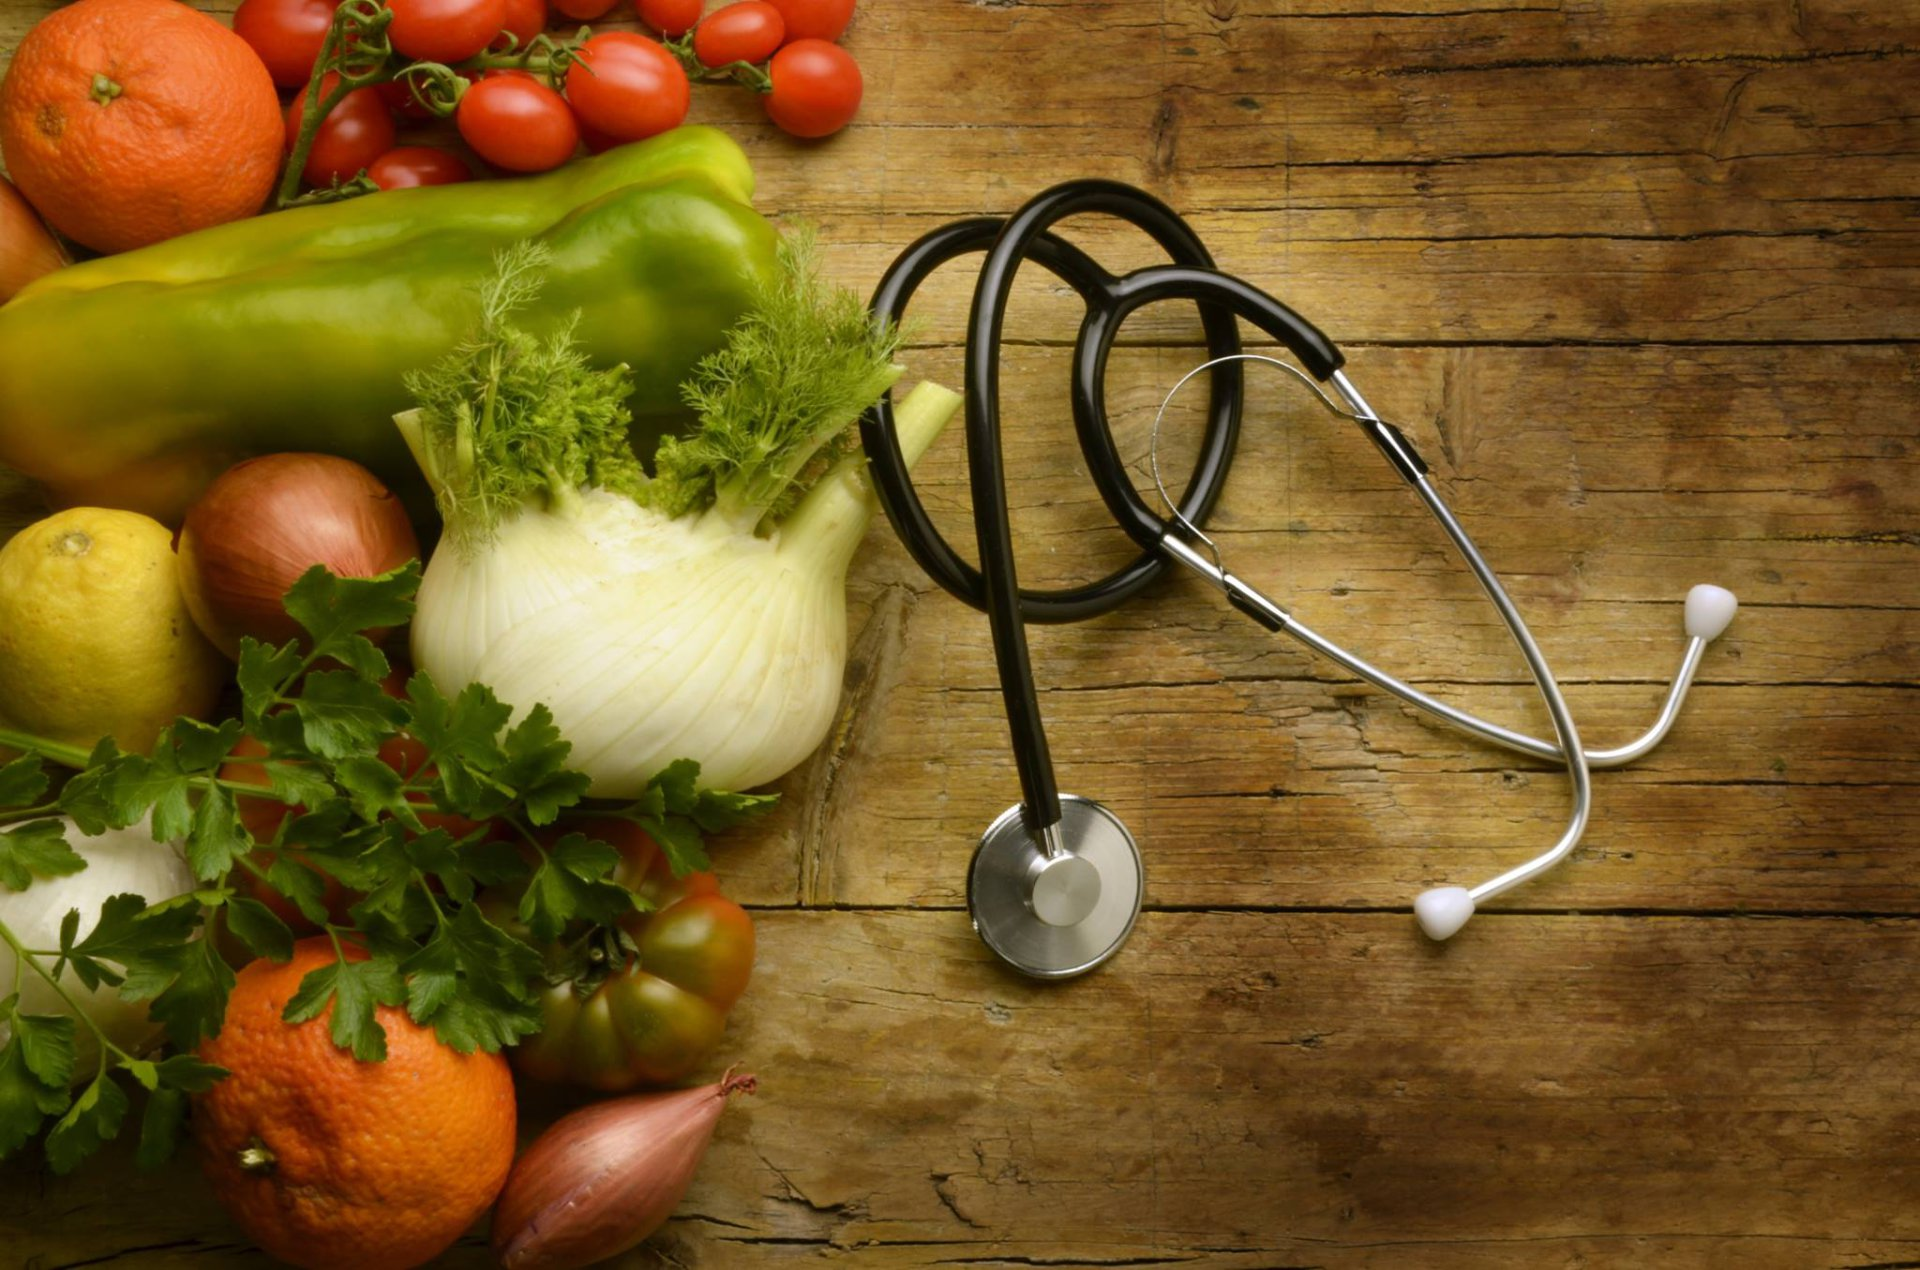 receptas sbitnya nuo hipertenzijos